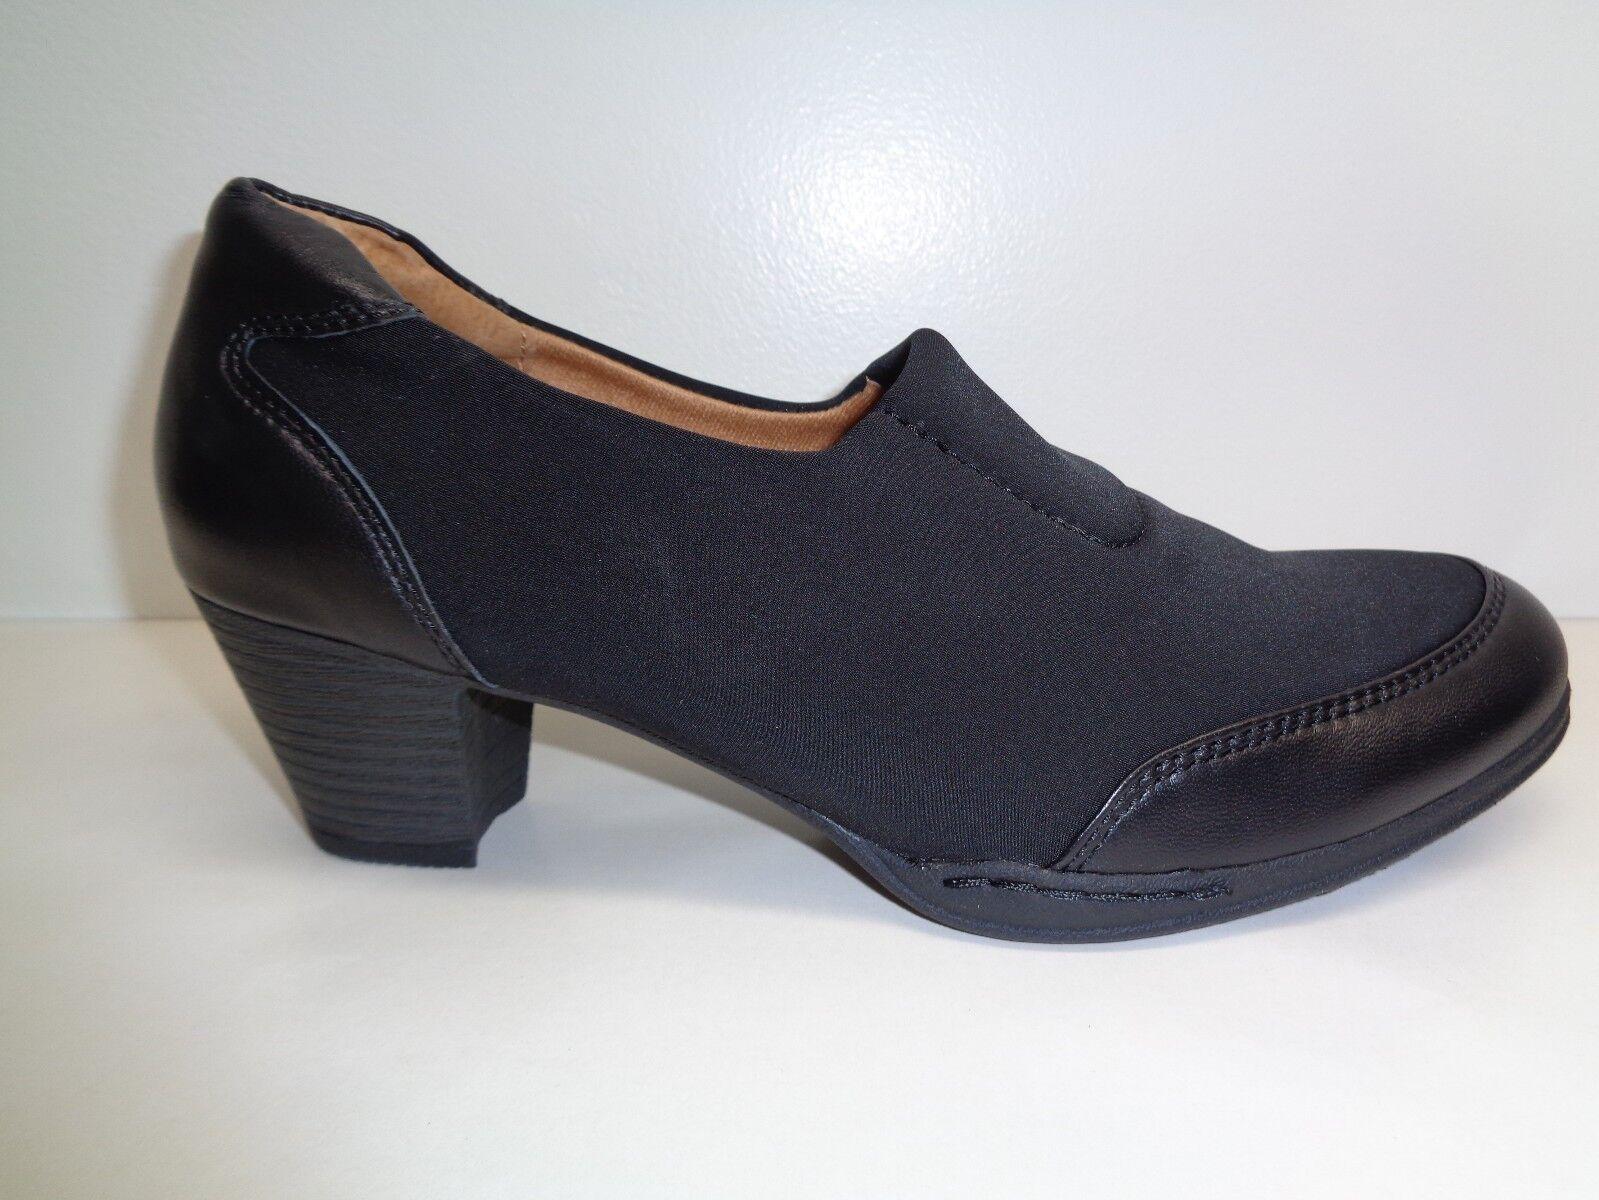 Montana Size 7.5 M COLETTE Black Fabric Leather Pumps Heels New Womens Shoes